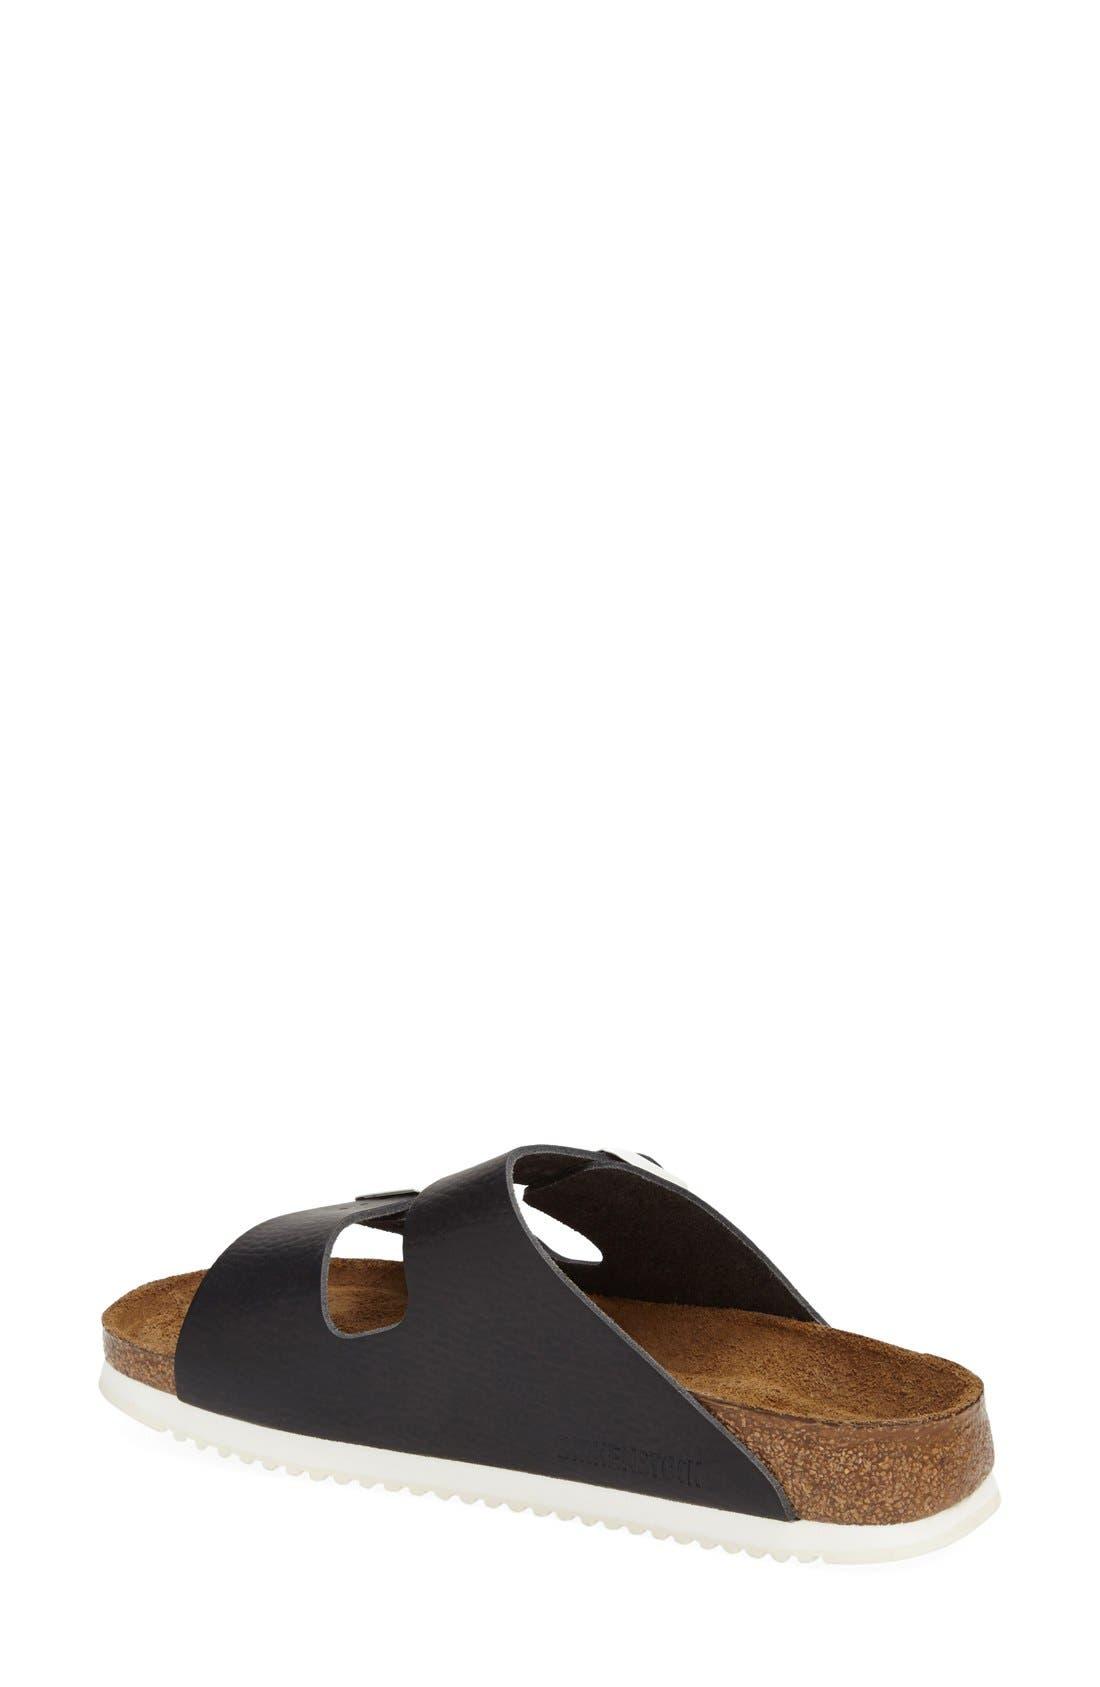 BIRKENSTOCK,                             'Arizona' Leather Double Band Footbed Sandal,                             Alternate thumbnail 3, color,                             001